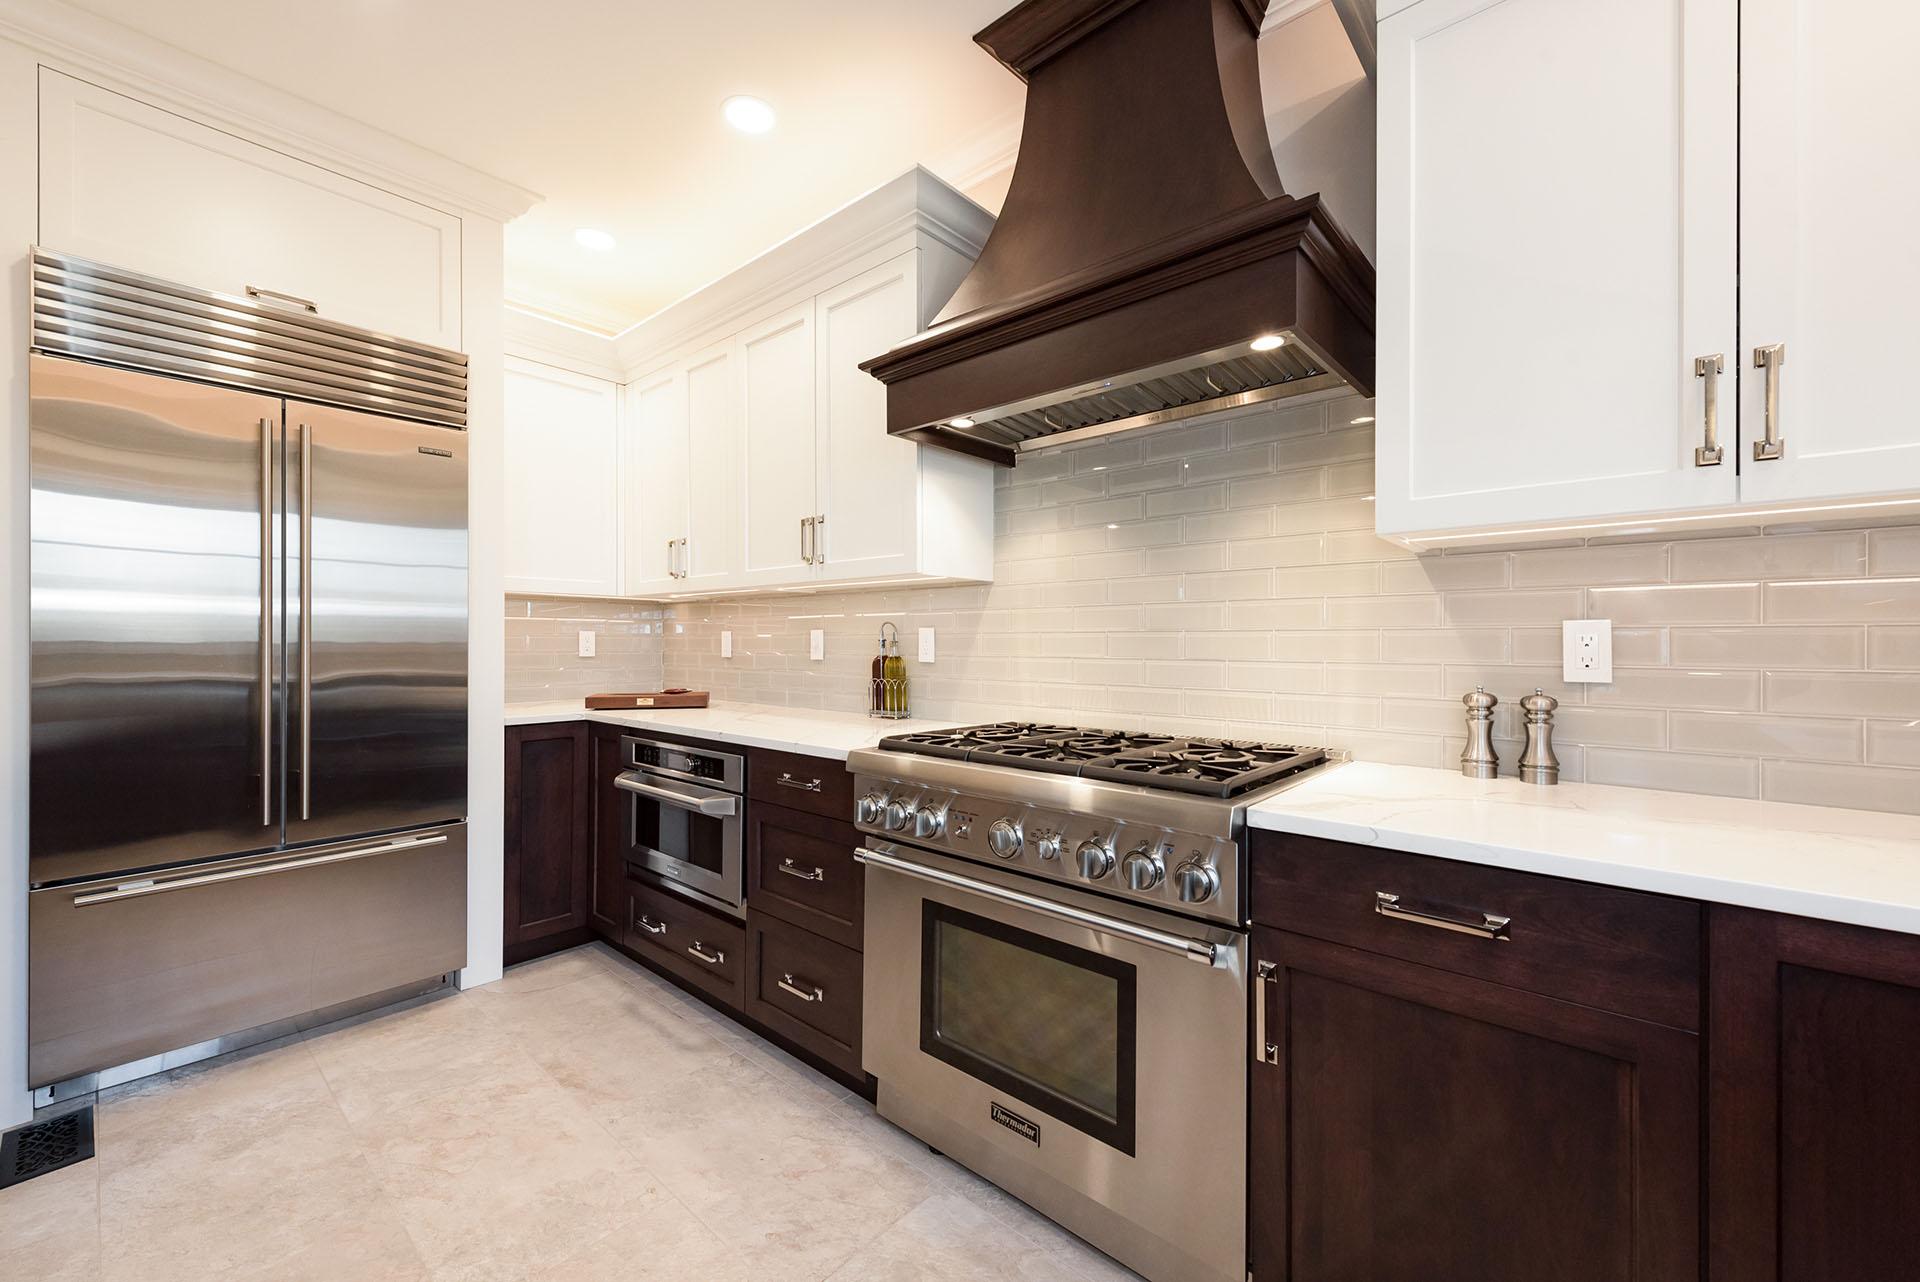 kitchen designed by Joan Bigg kitchen choreography kitchen design ny metro area